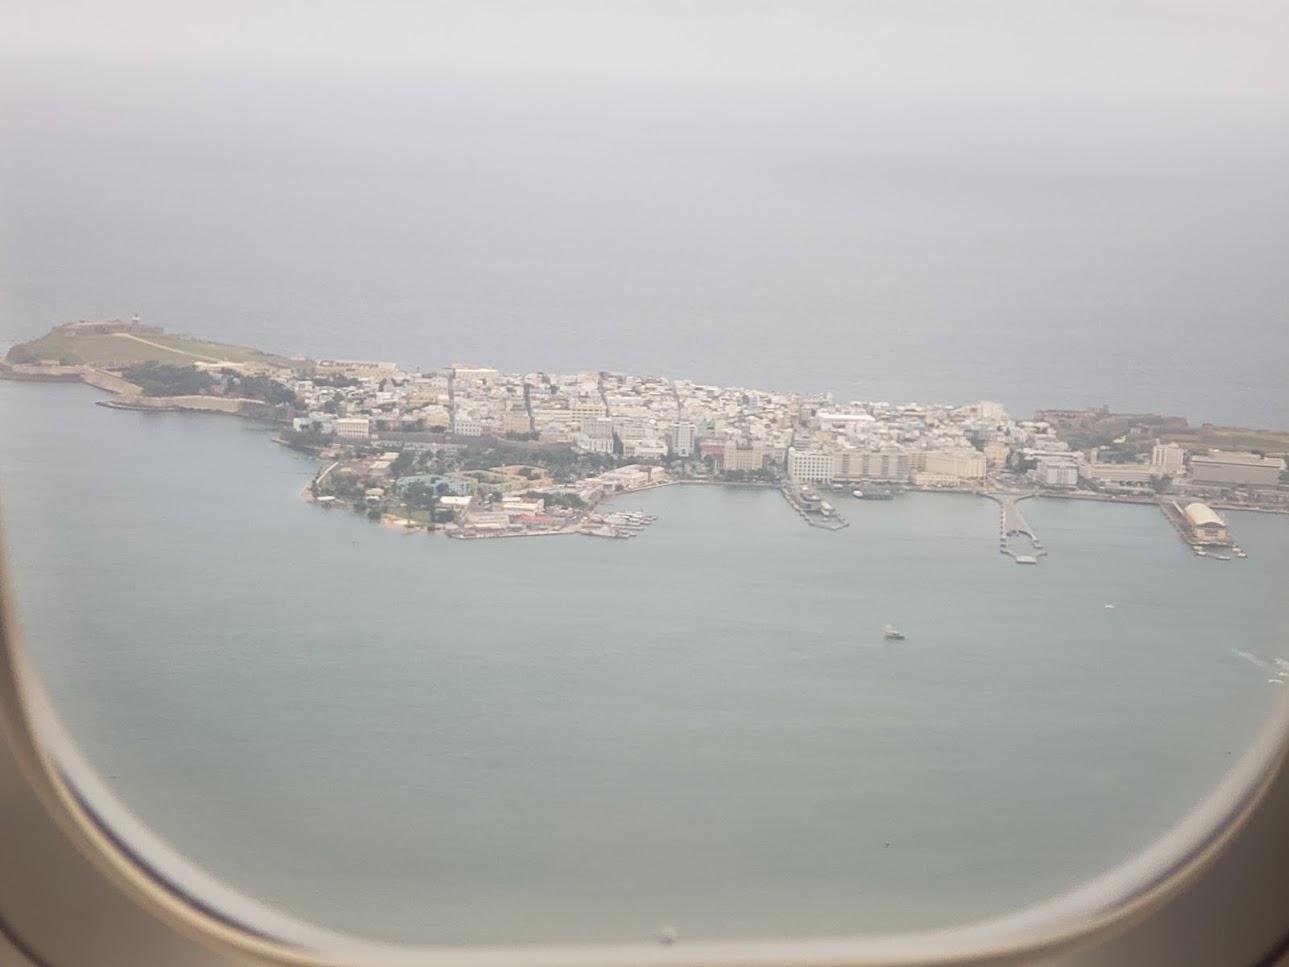 Puerto Rico - August 2018 - Arriving 4